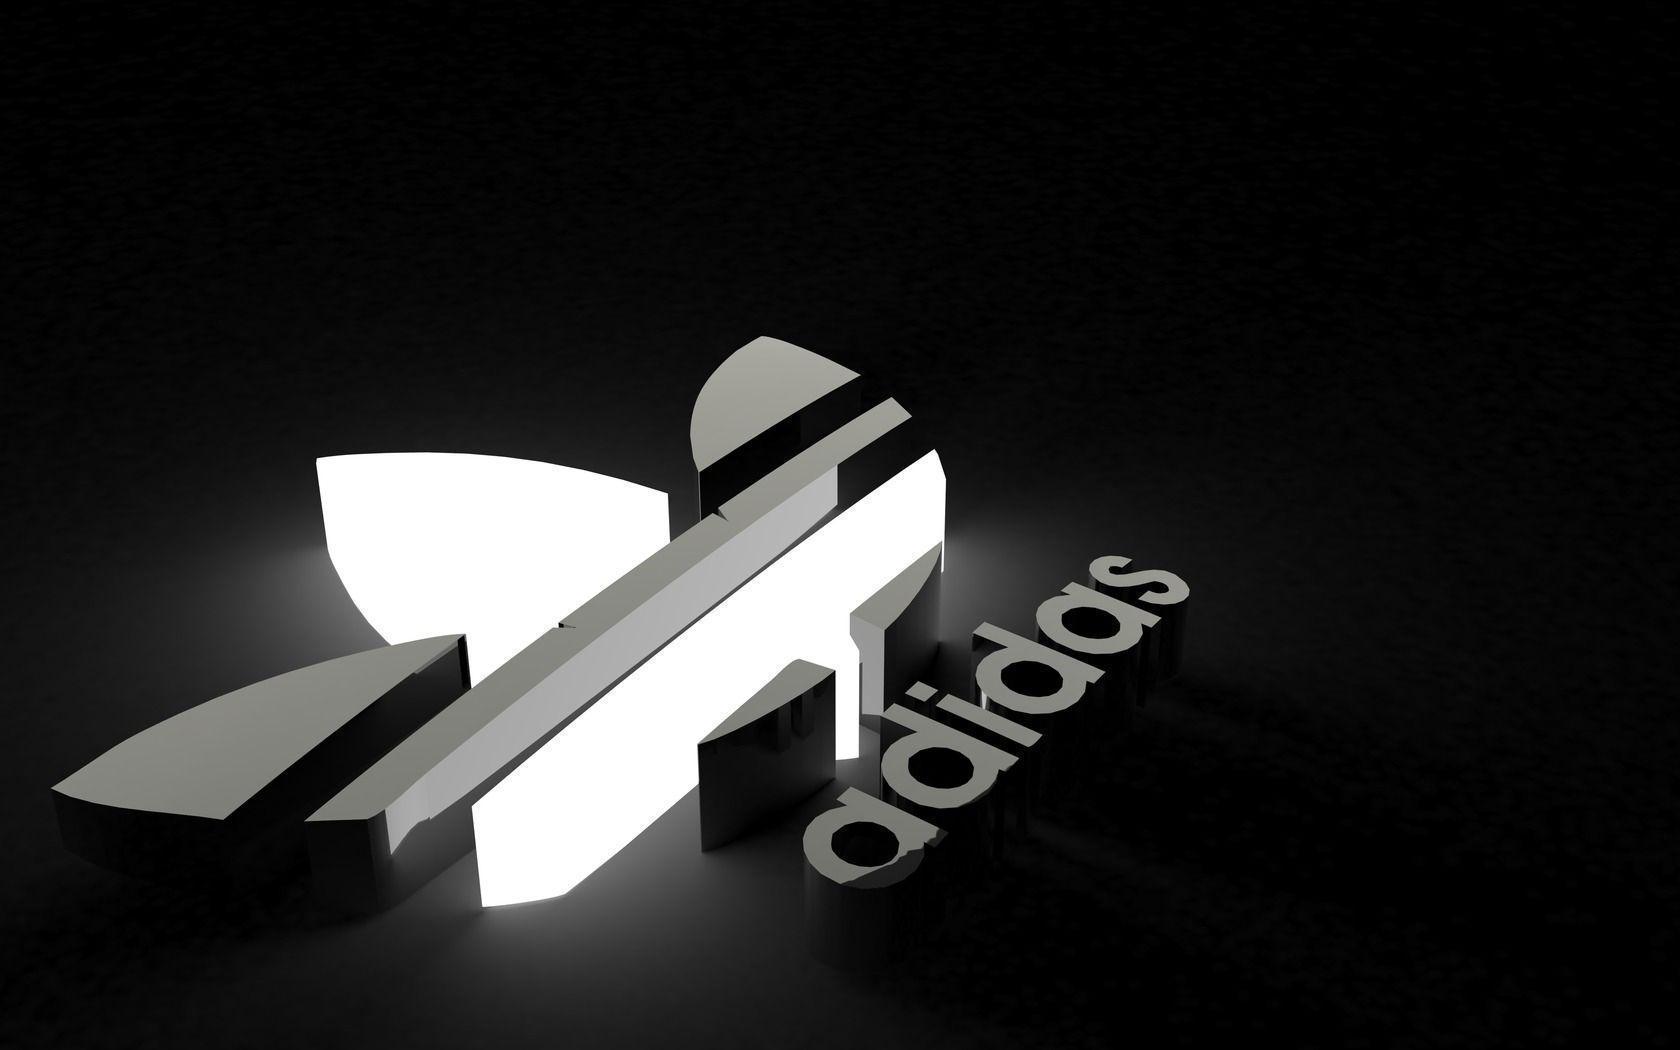 Adidas Logo Wallpaper 2017 Wallpapersafari